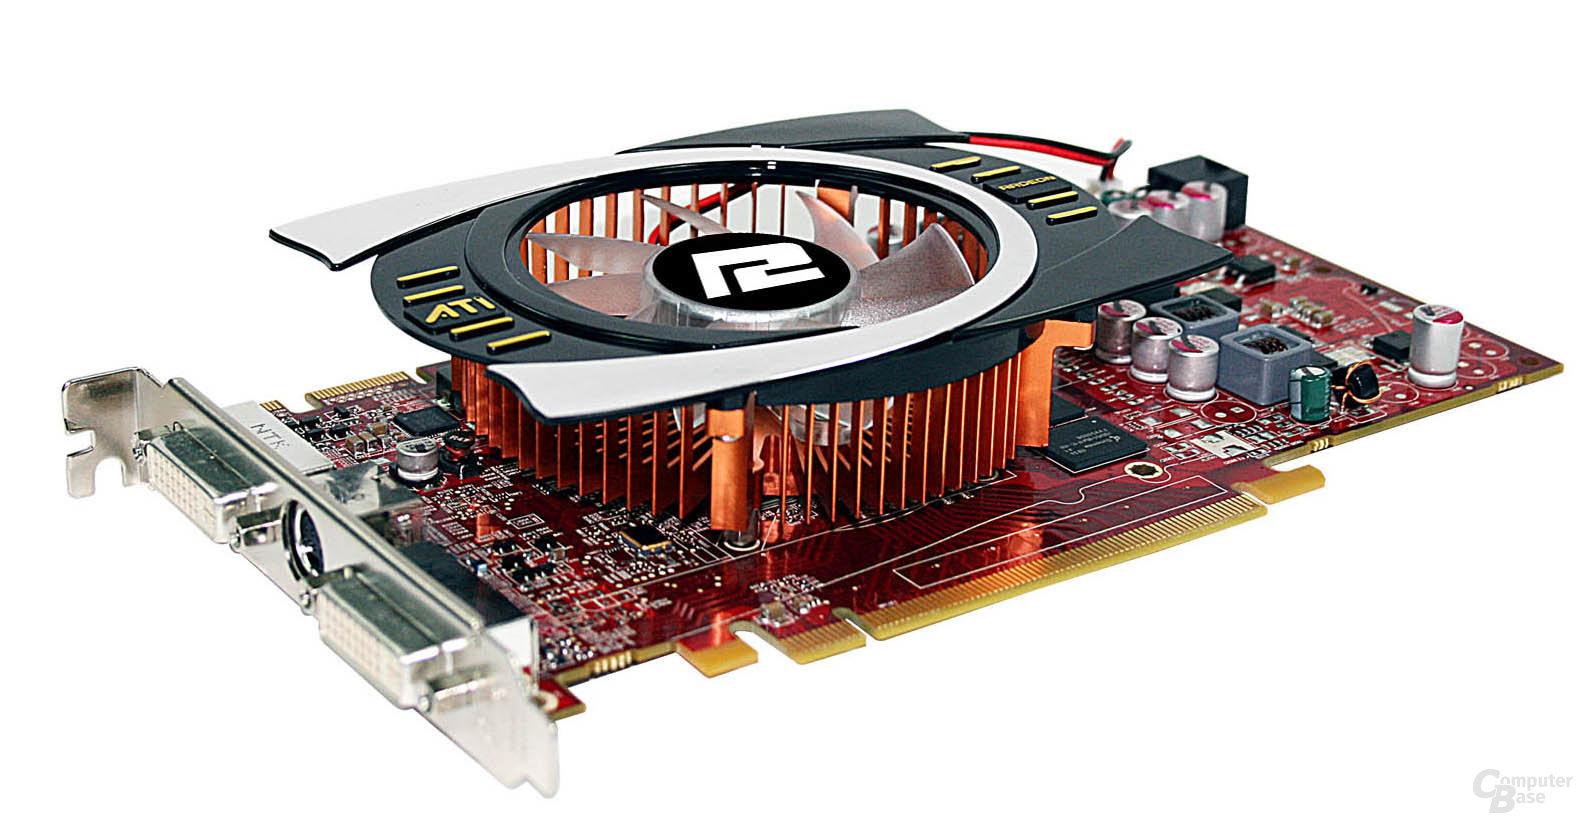 PowerColor Radeon HD 4770